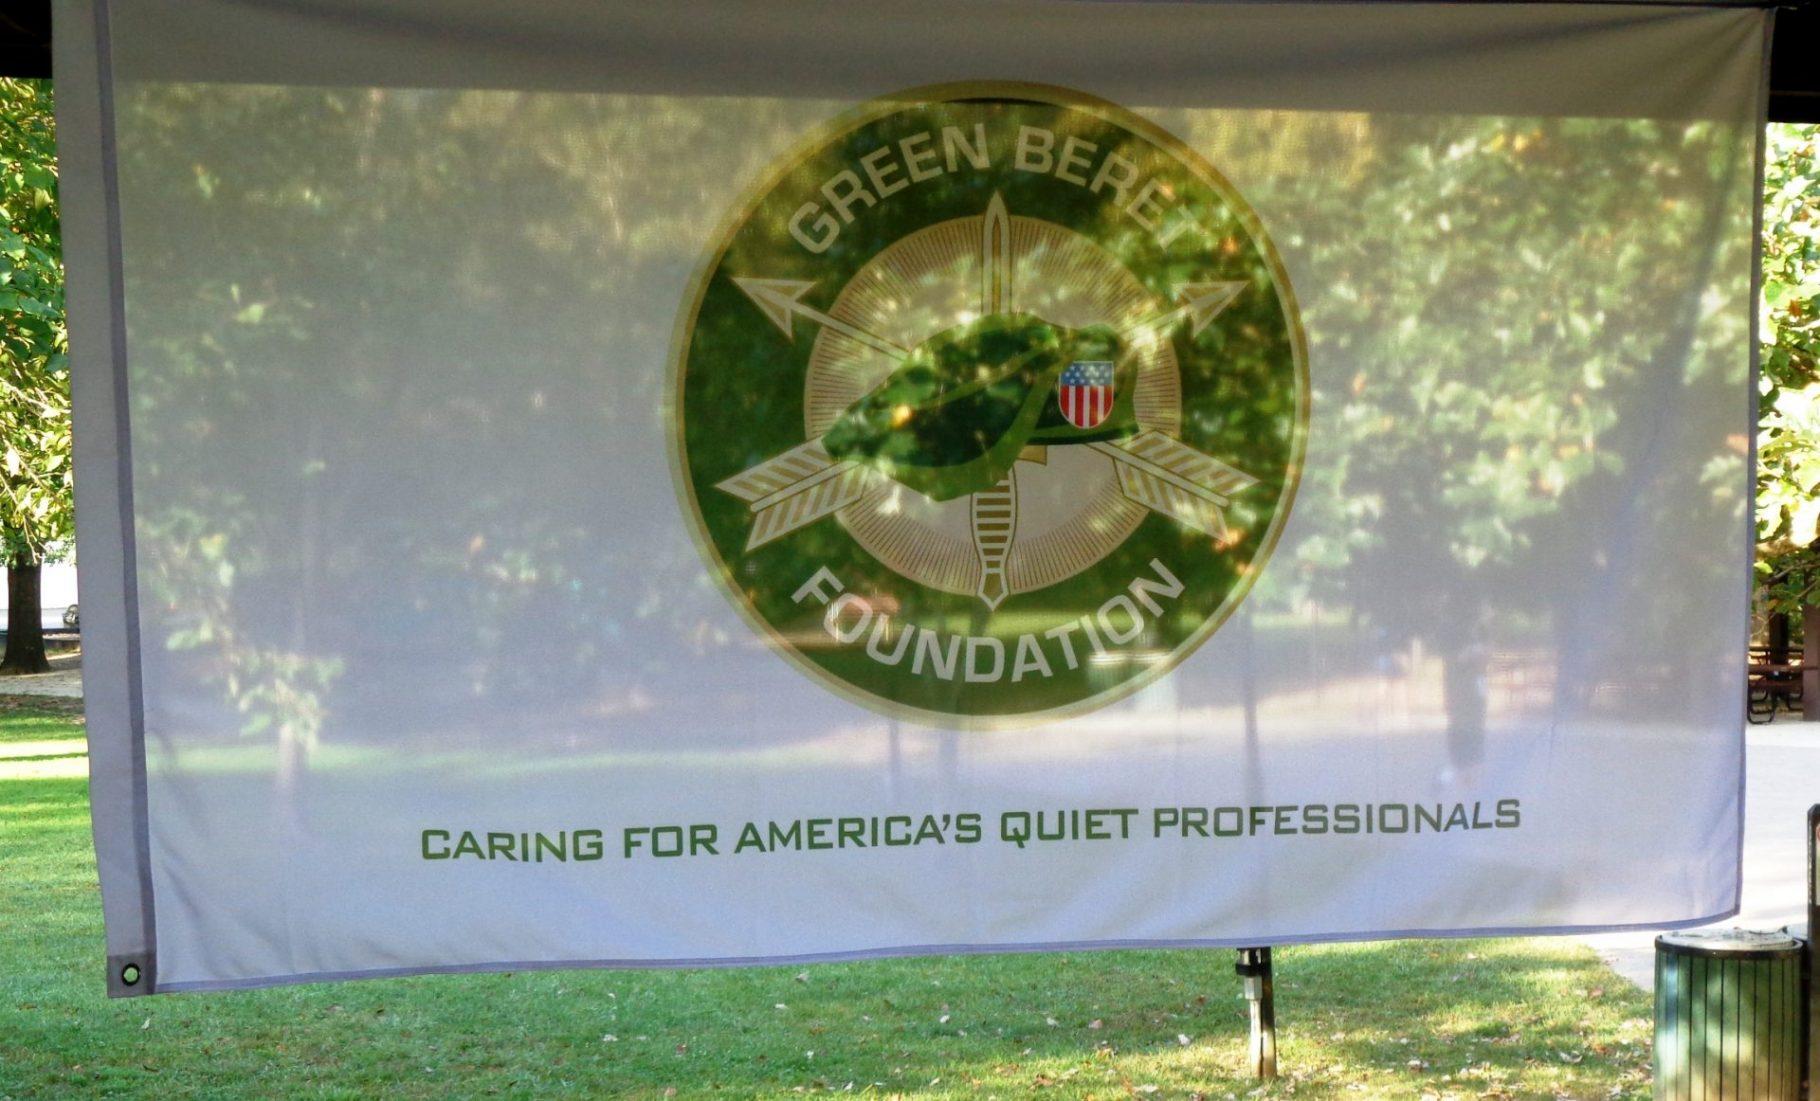 Green Beret Foundatin event